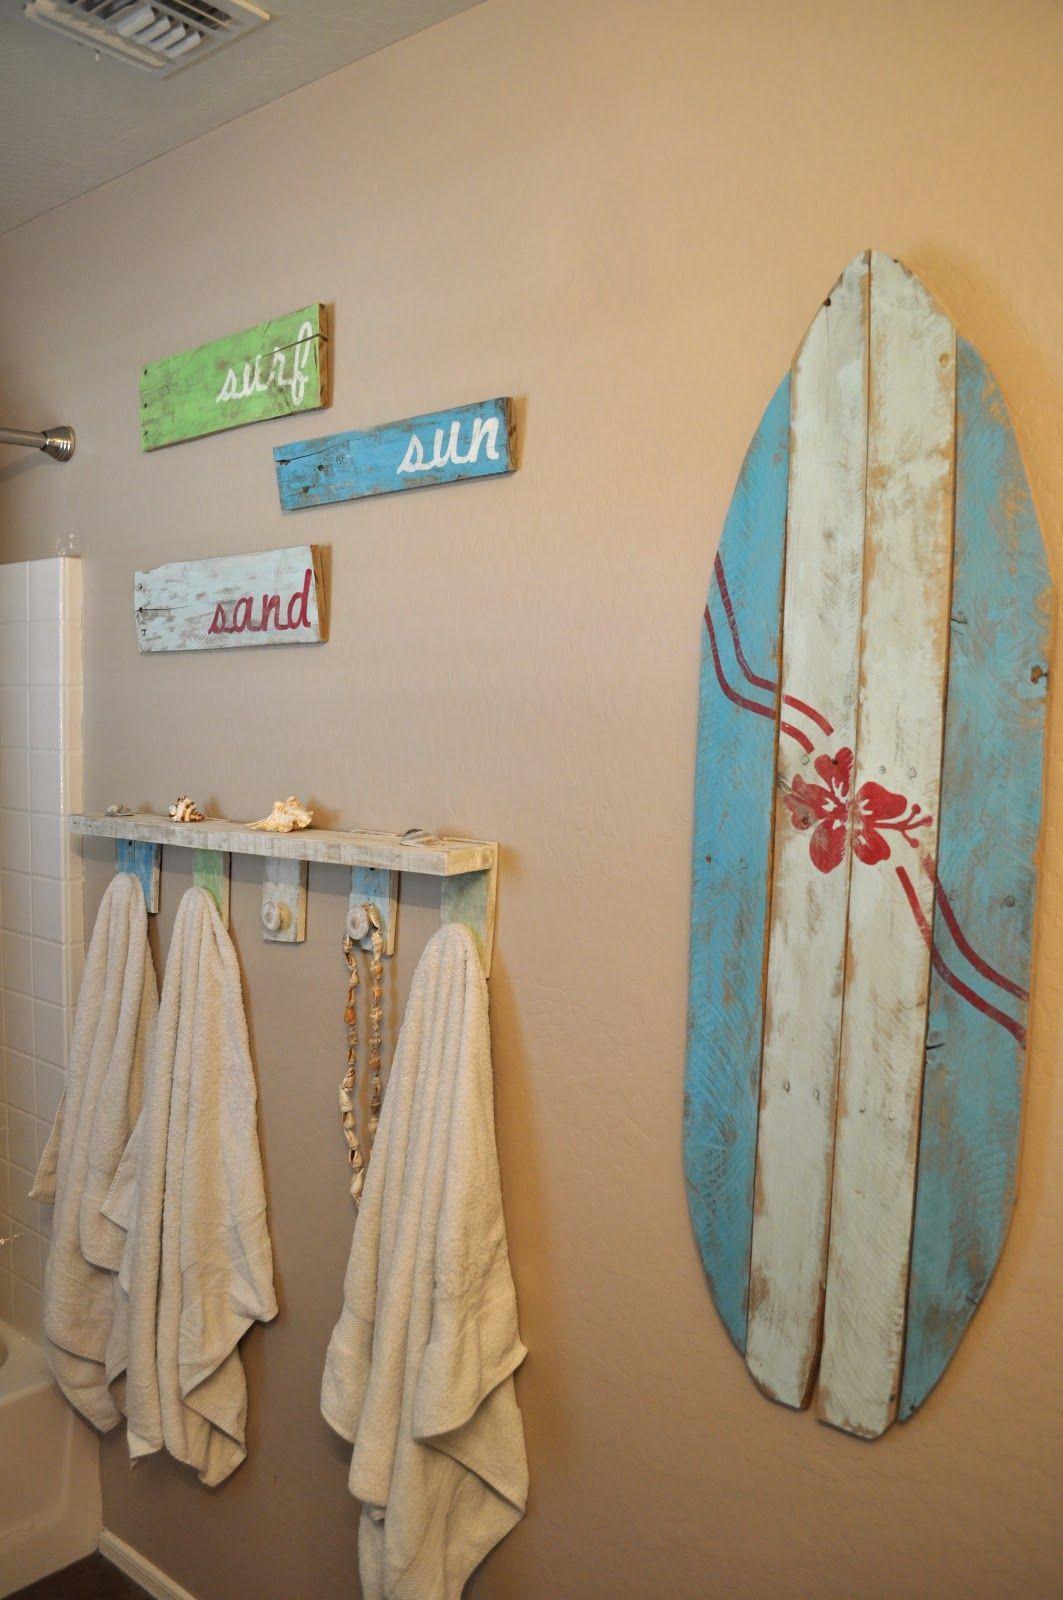 seeshellspace: My Beachy Bathroom Makeover for under $30 ...